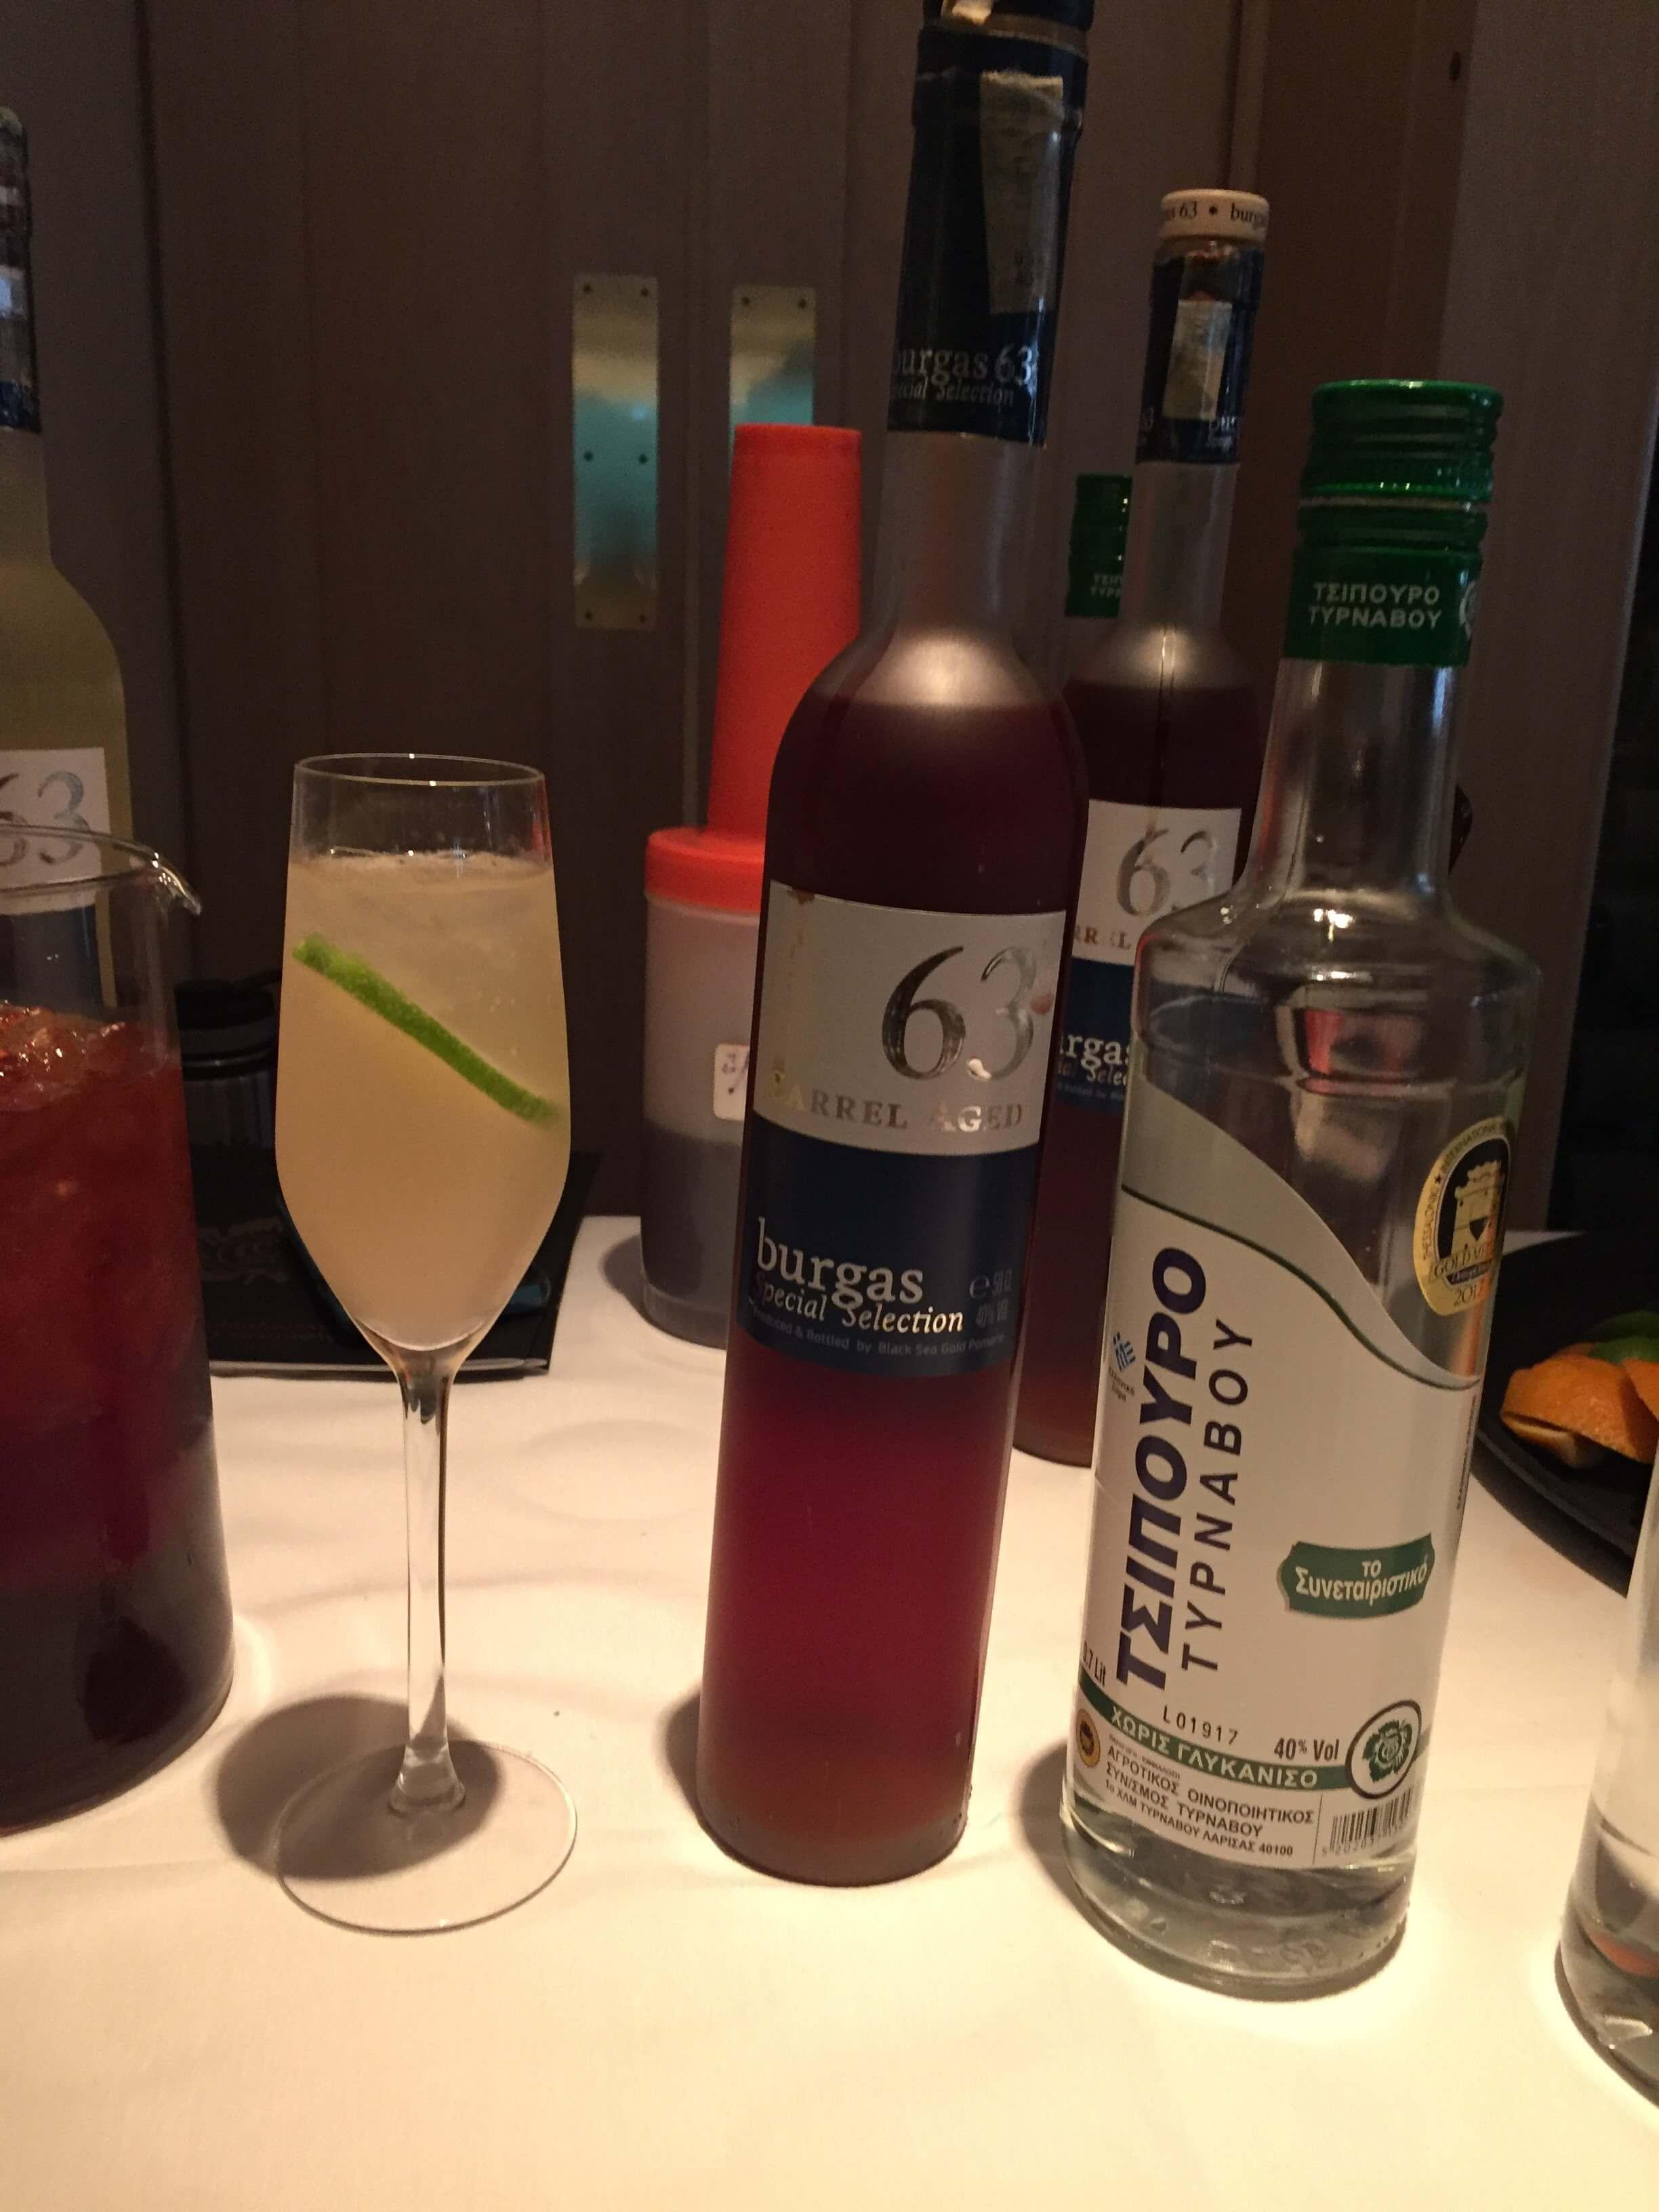 Bulgarian Rakia and Greek Tsipouro tasting - What's Shakin' week of May 15, 2017